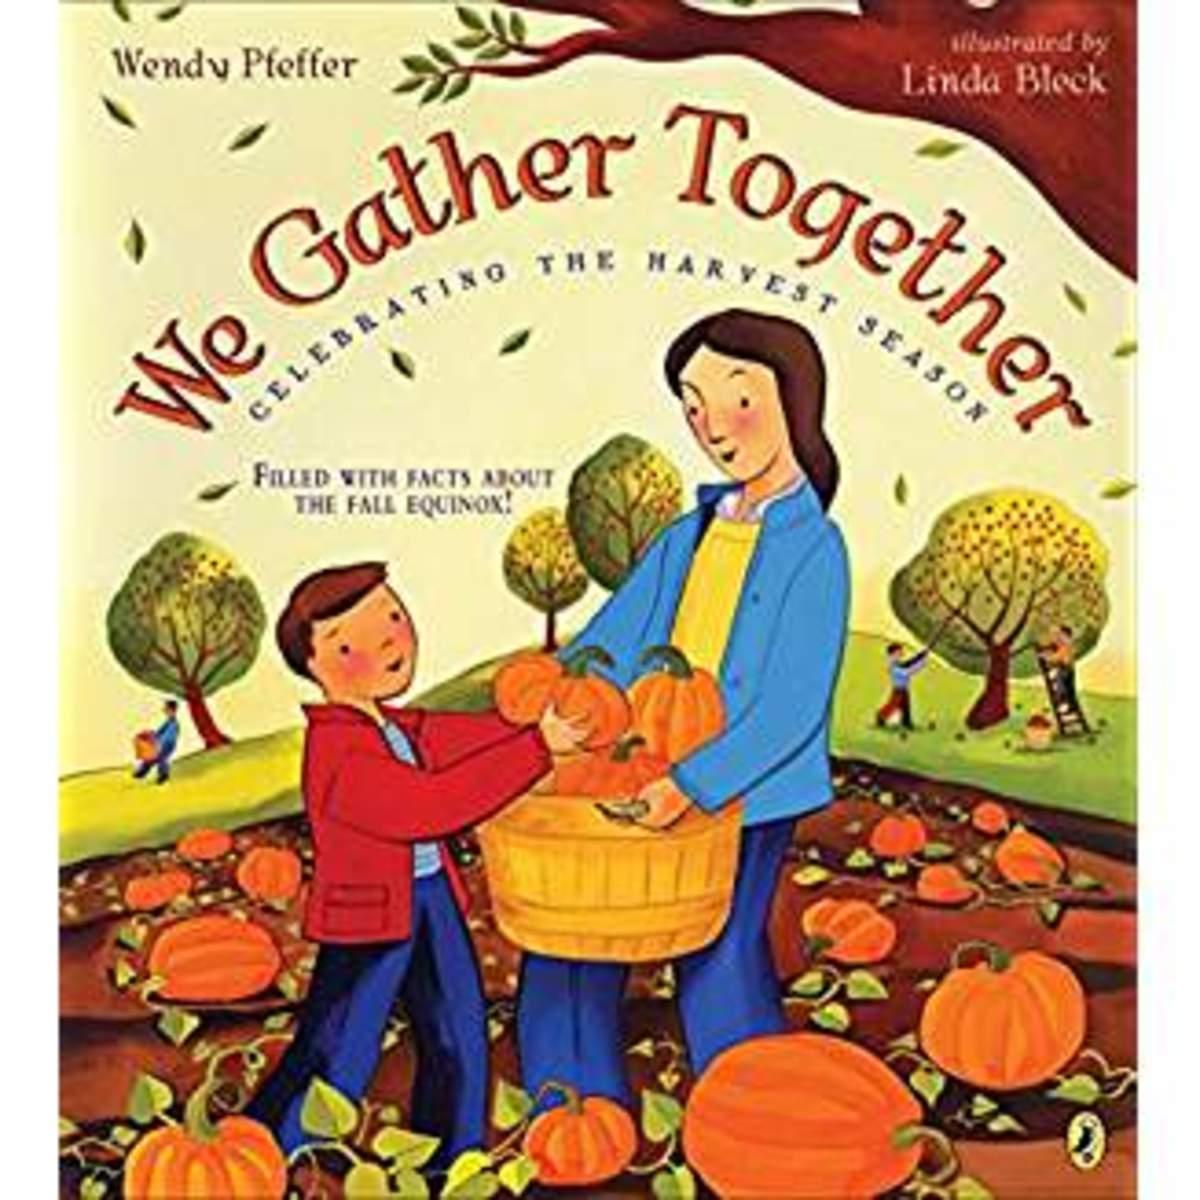 We Gather Together by Wendy Pfeffer